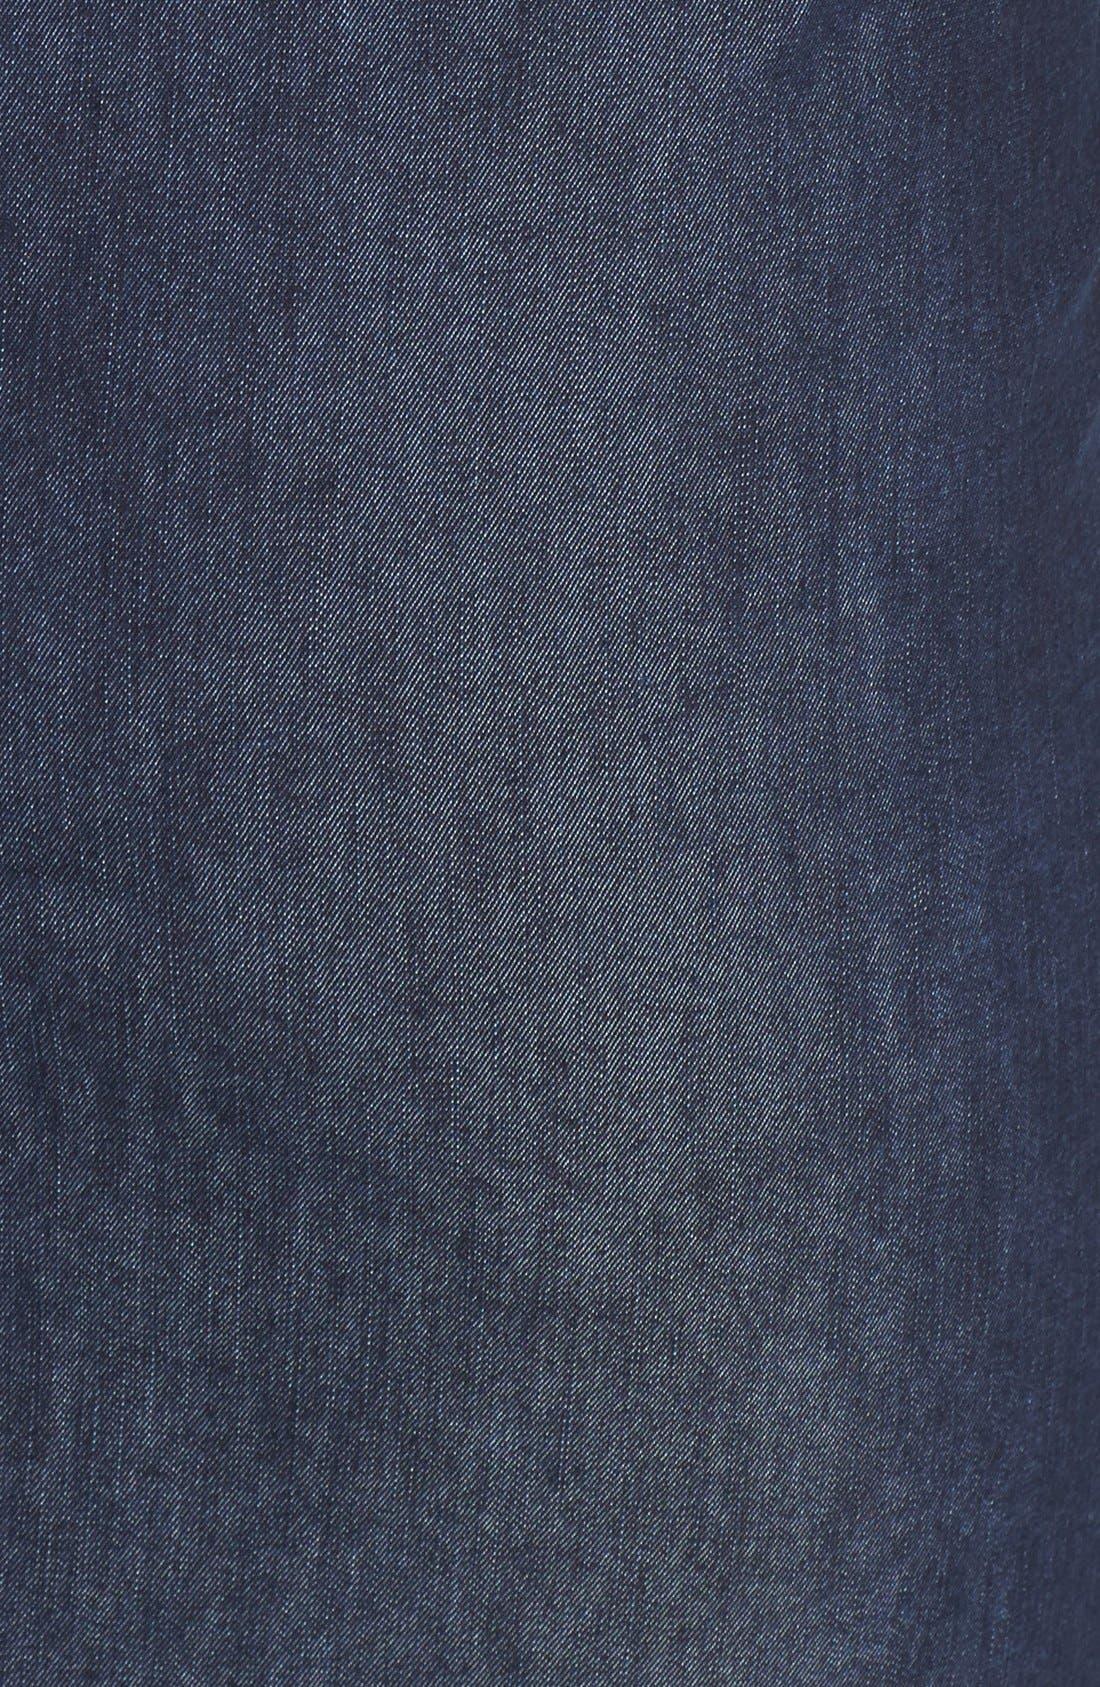 Alternate Image 3  - Halogen® Stretch Cotton Blend Pencil Skirt (Regular & Petite)